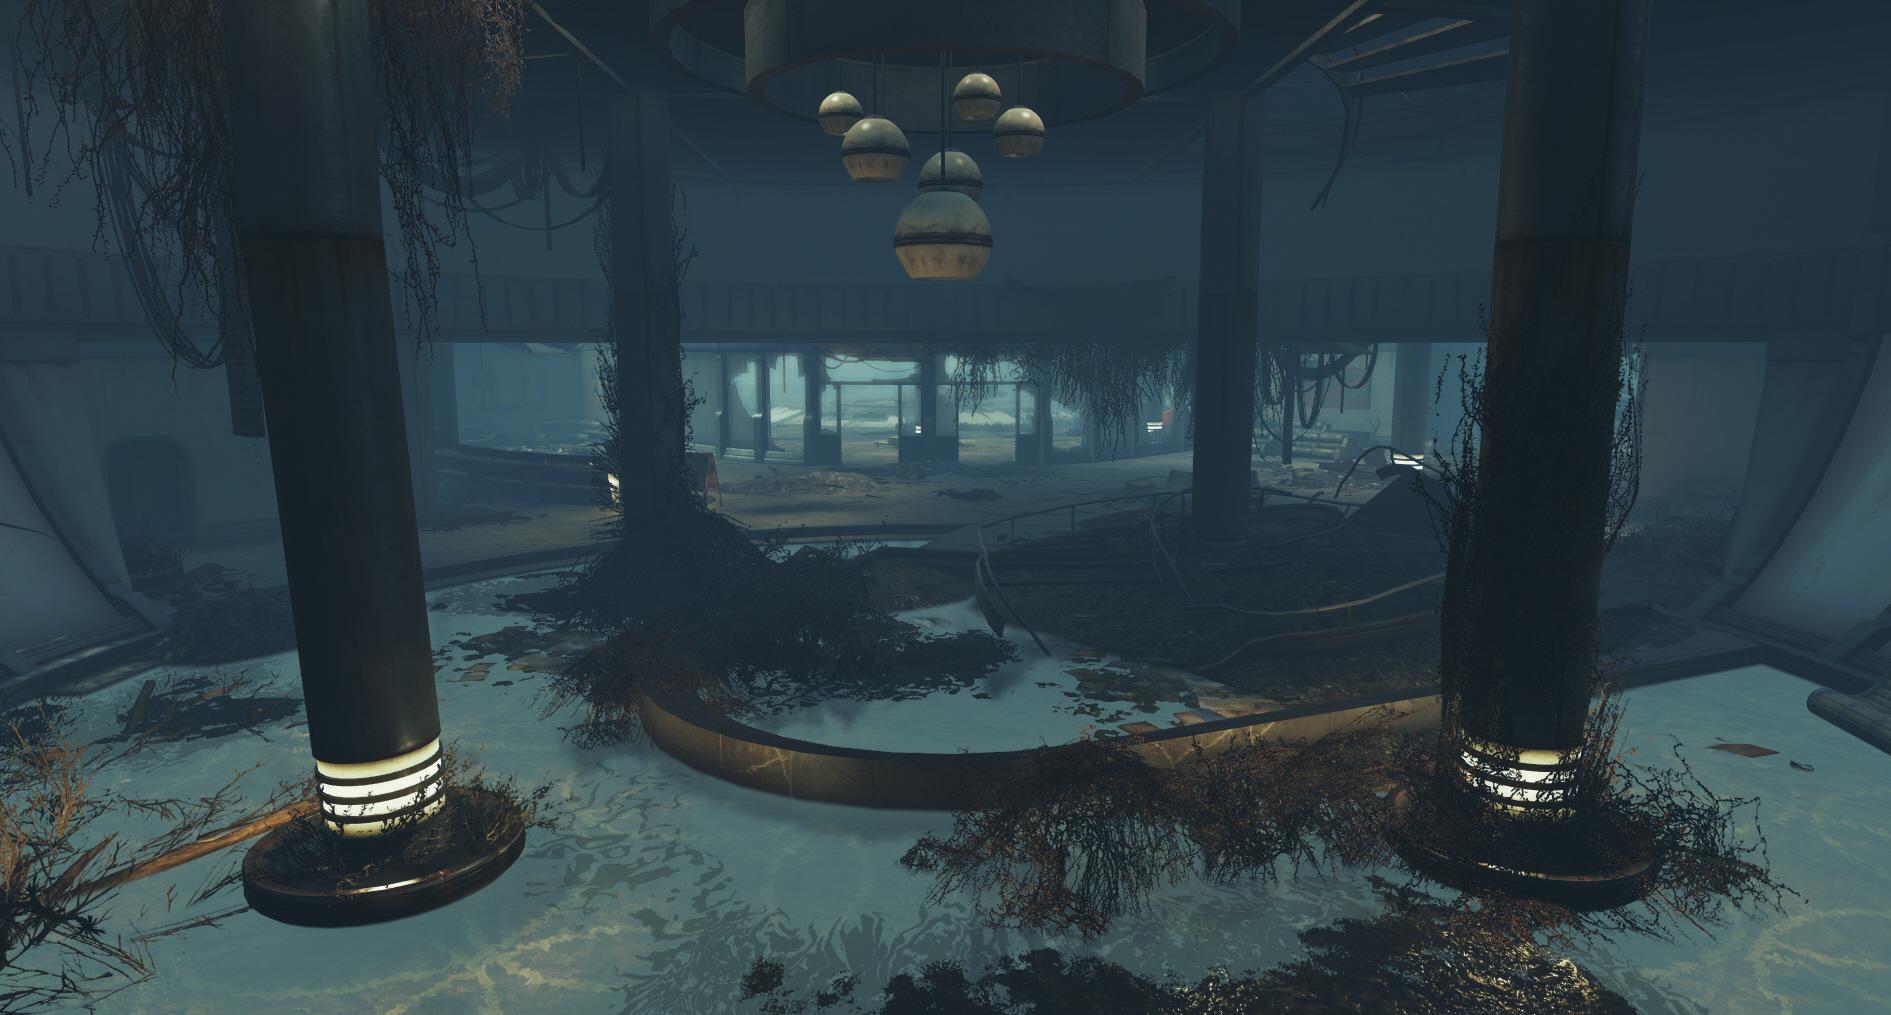 CliffsEdge-Lobby1-FarHarbor